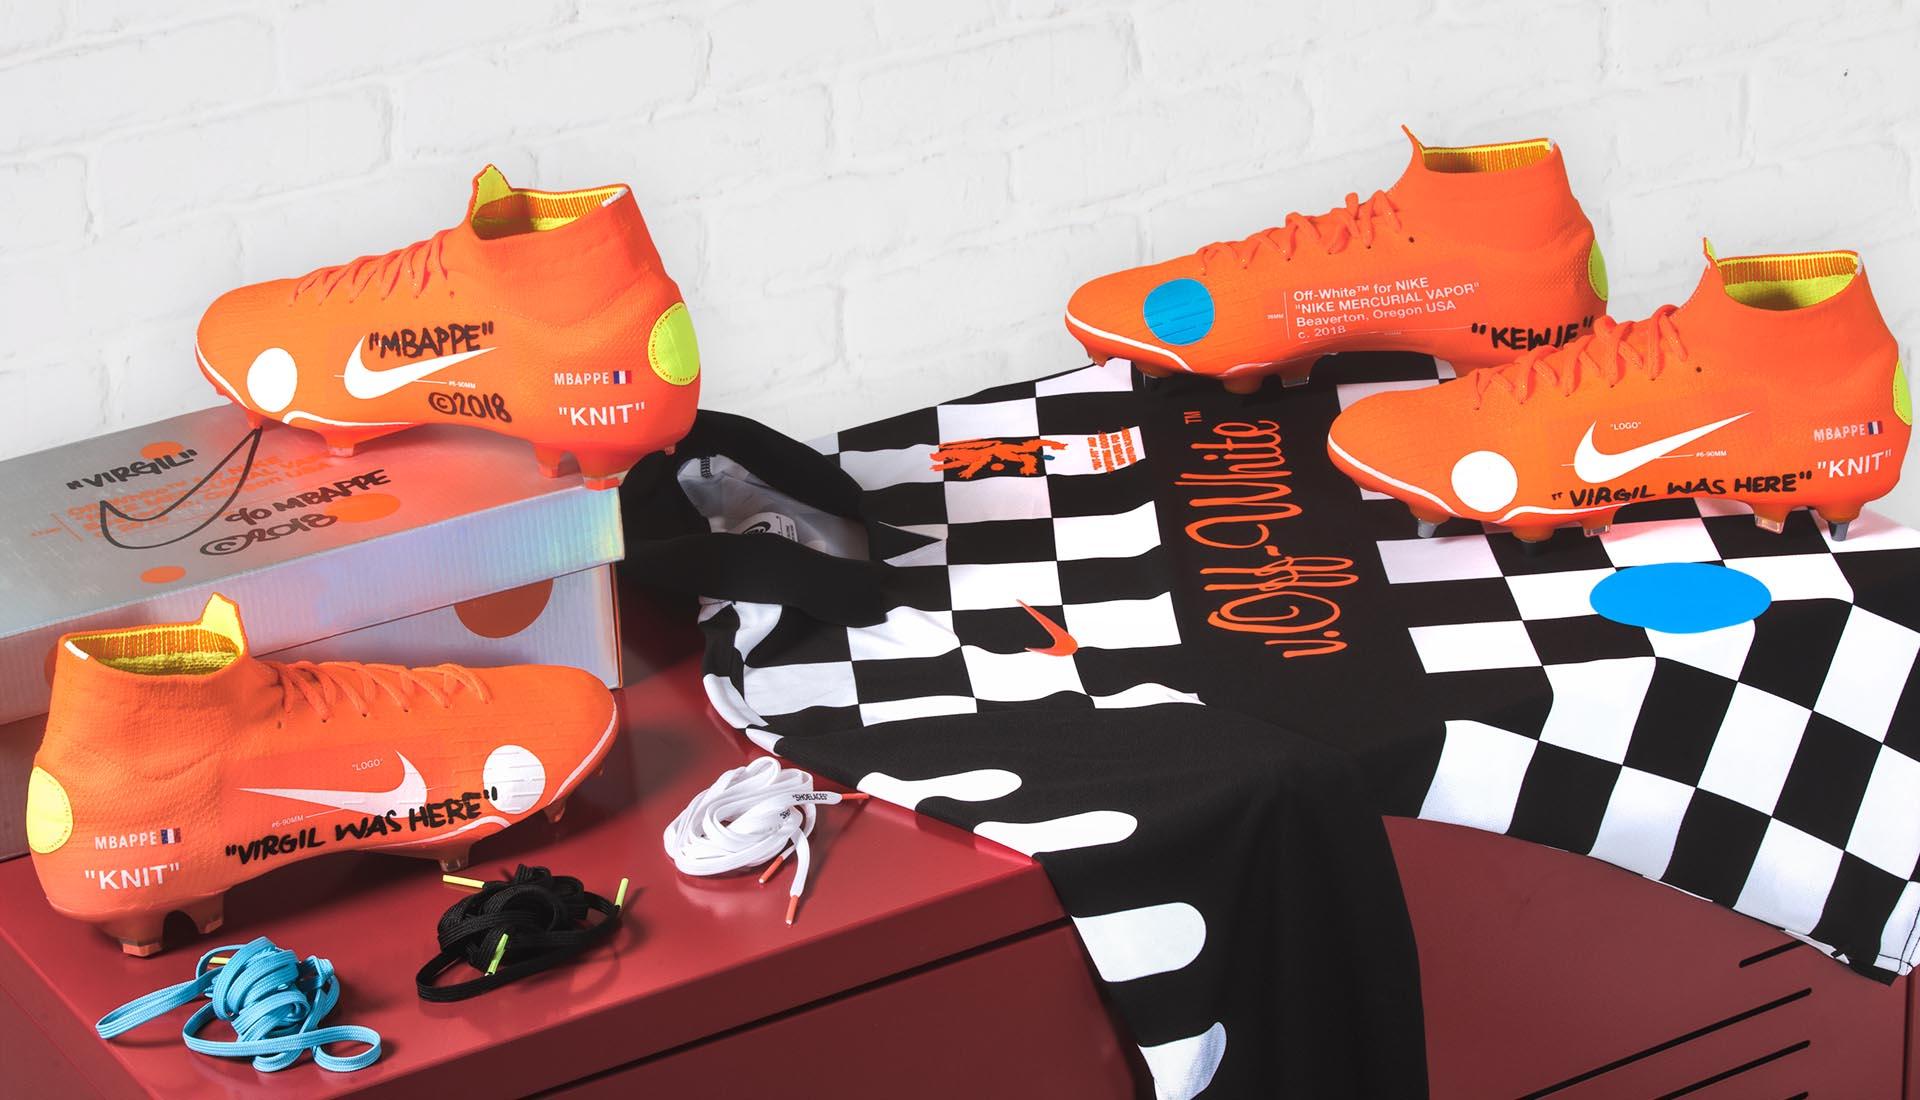 7dfaa595b96023 Kylian Mbappé Launches The Nike x Virgil Abloh Mercurial 360 ...